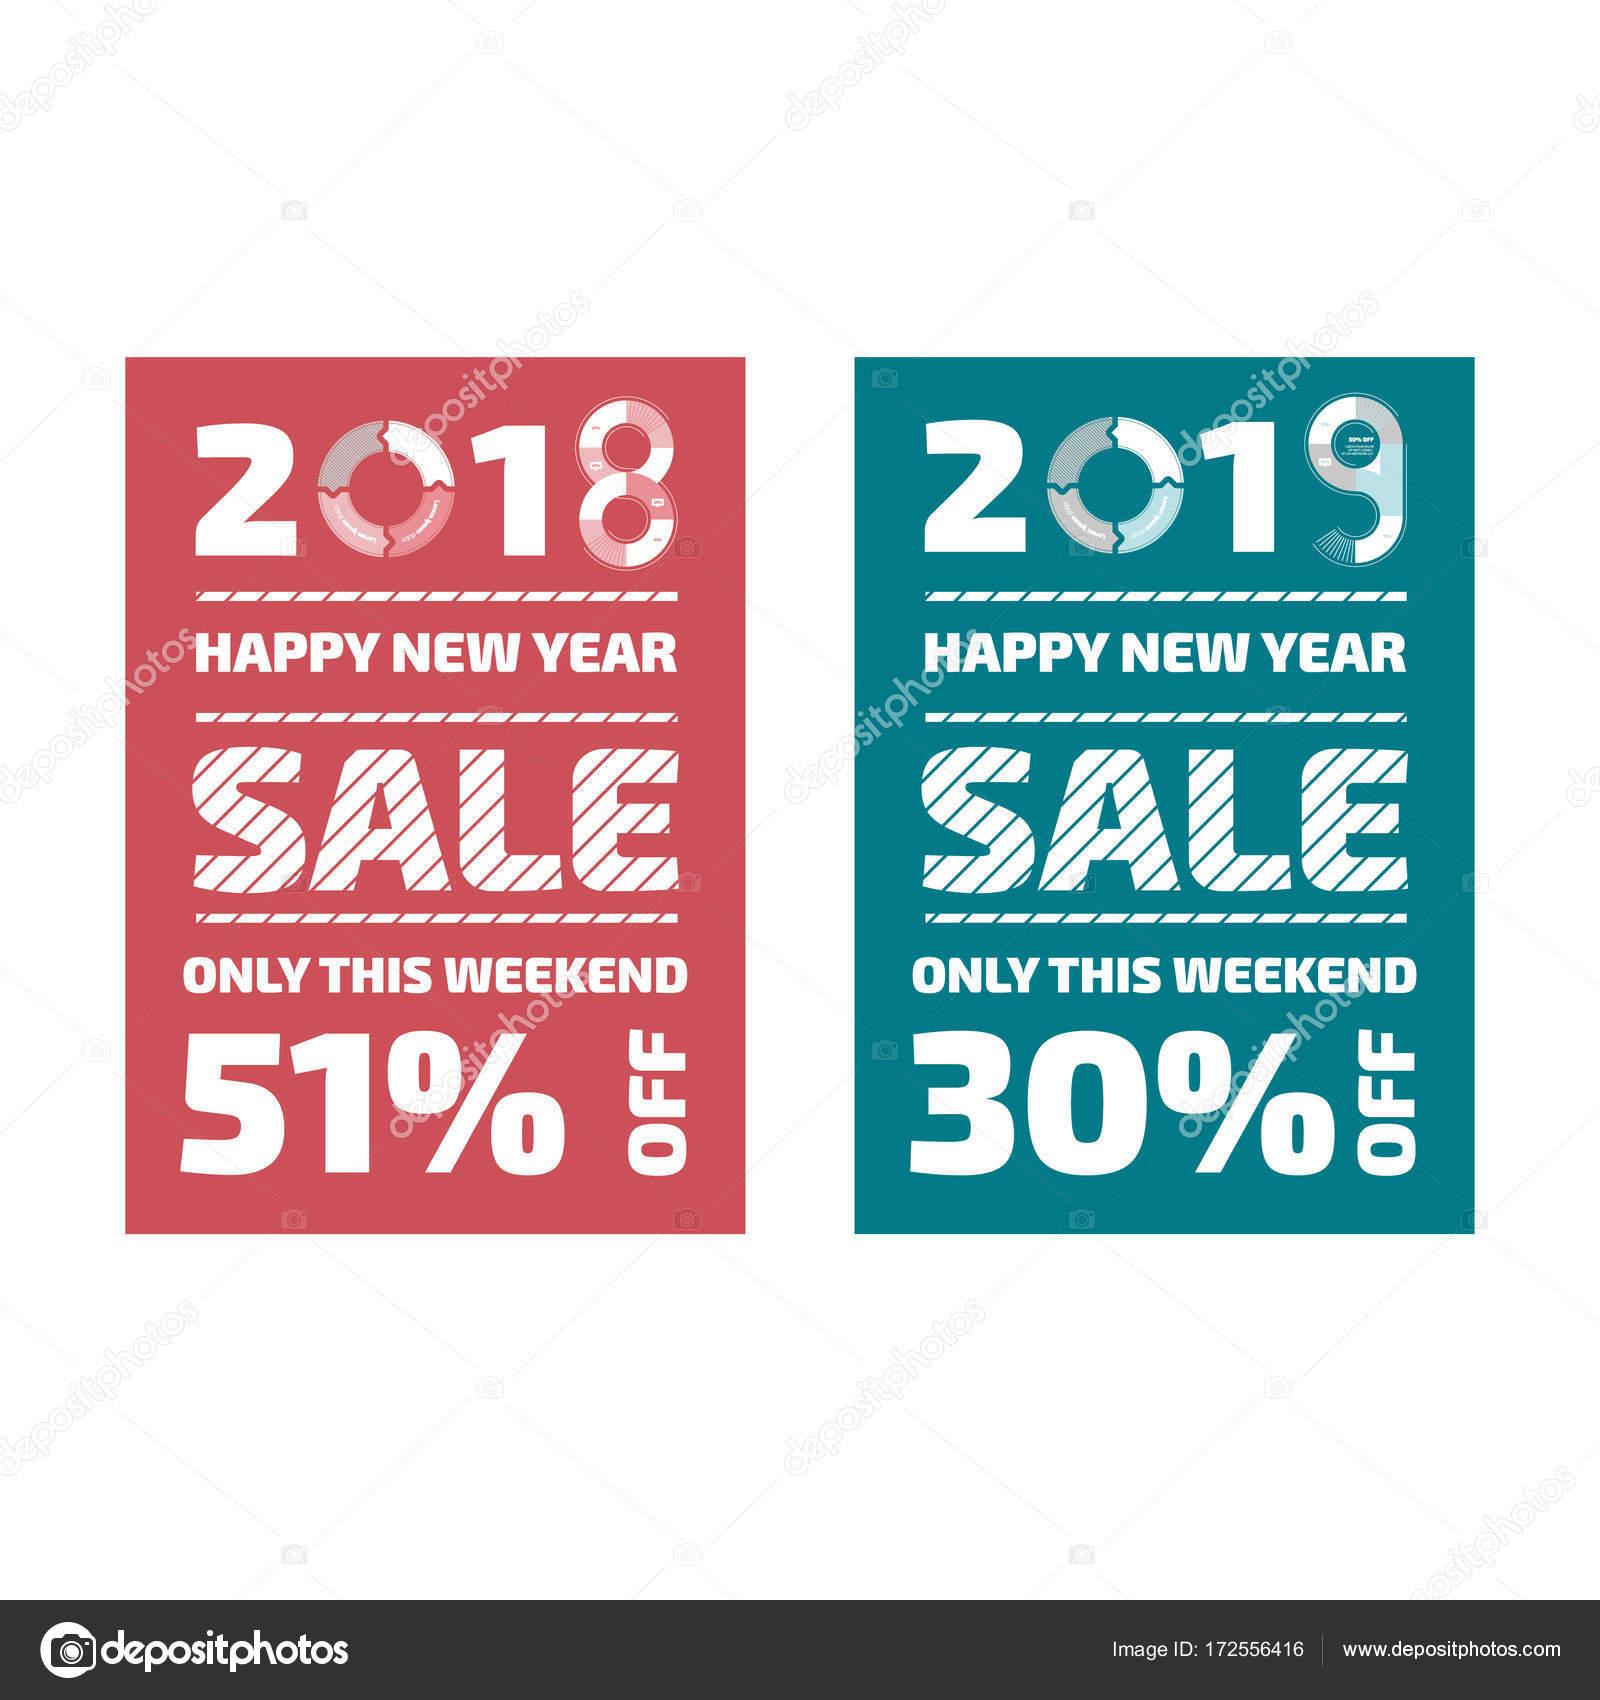 Enterprise coupons 2019